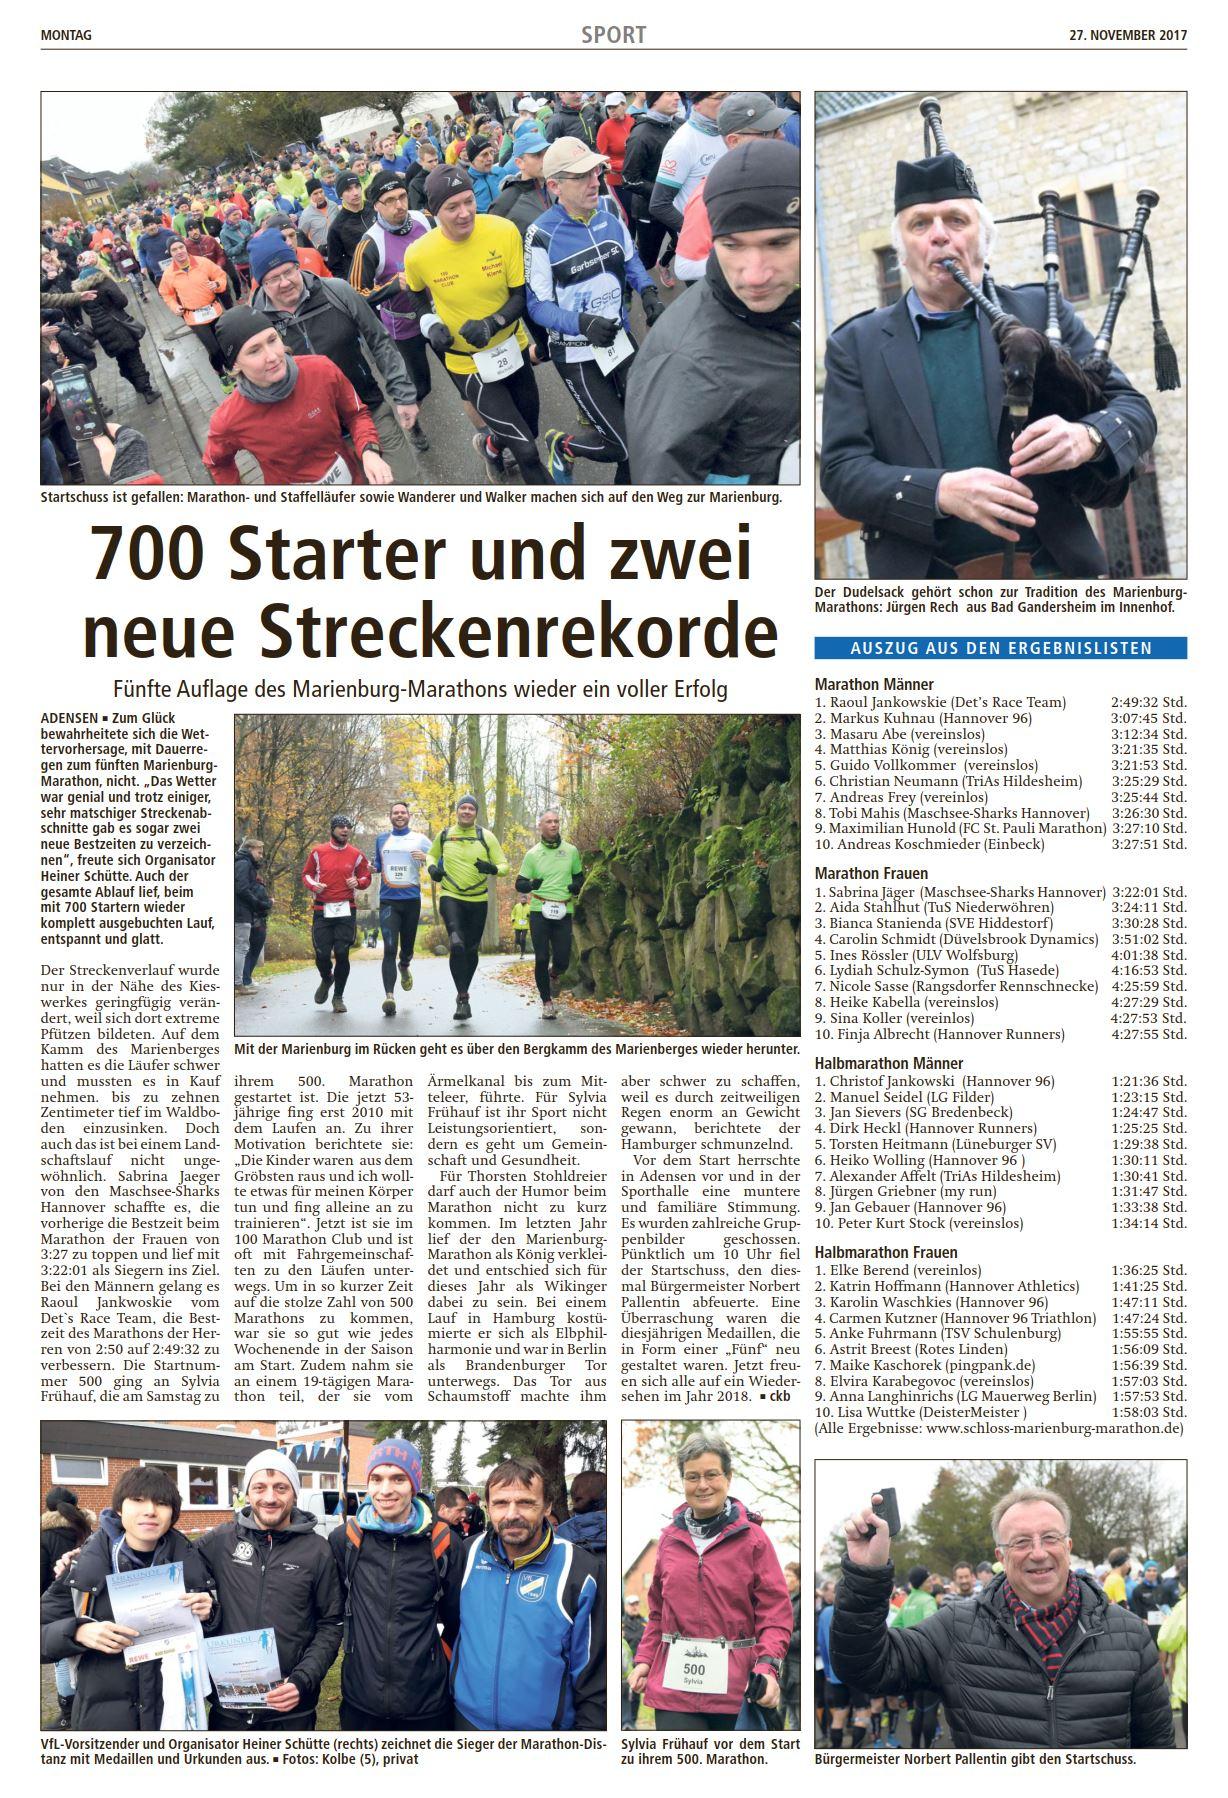 20171127_LDZ Marathon Schloss Marienburg 3